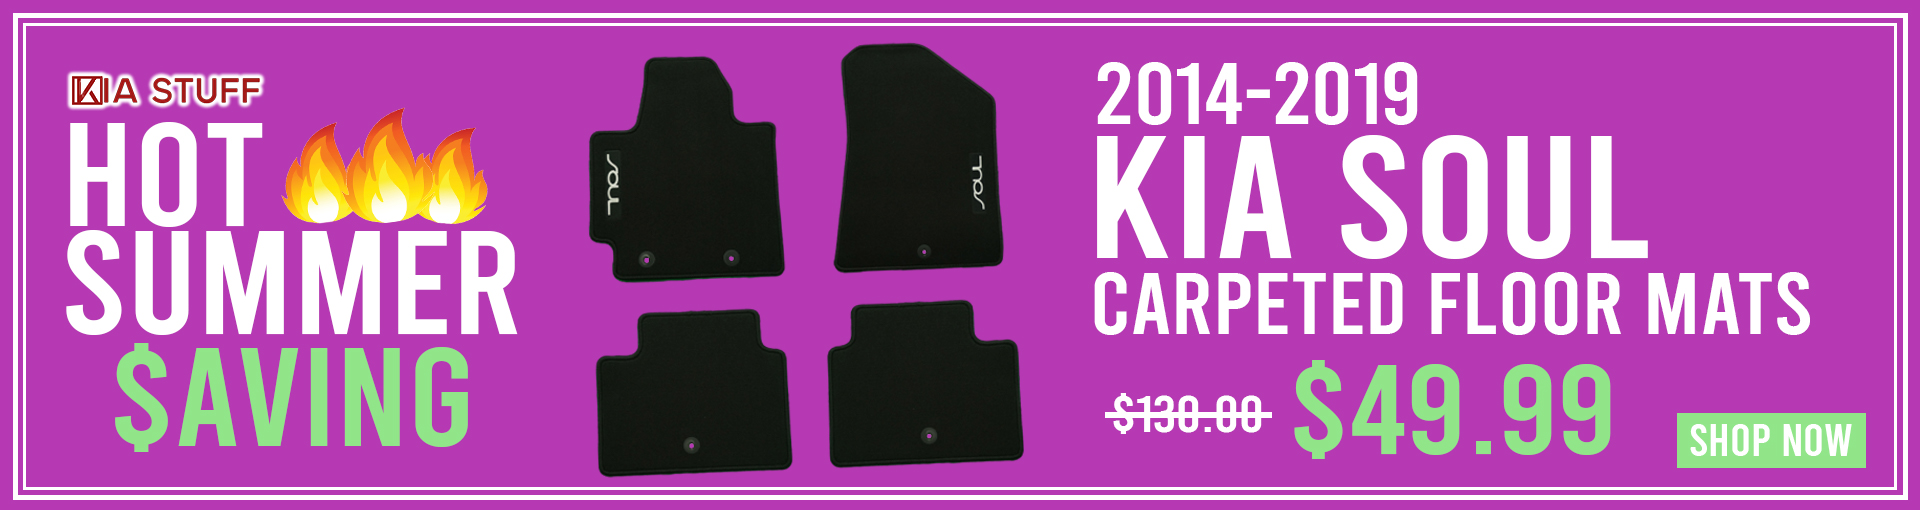 Hot Summer Savings: 2014-2019 Kia Soul Carpeted Floor Mats